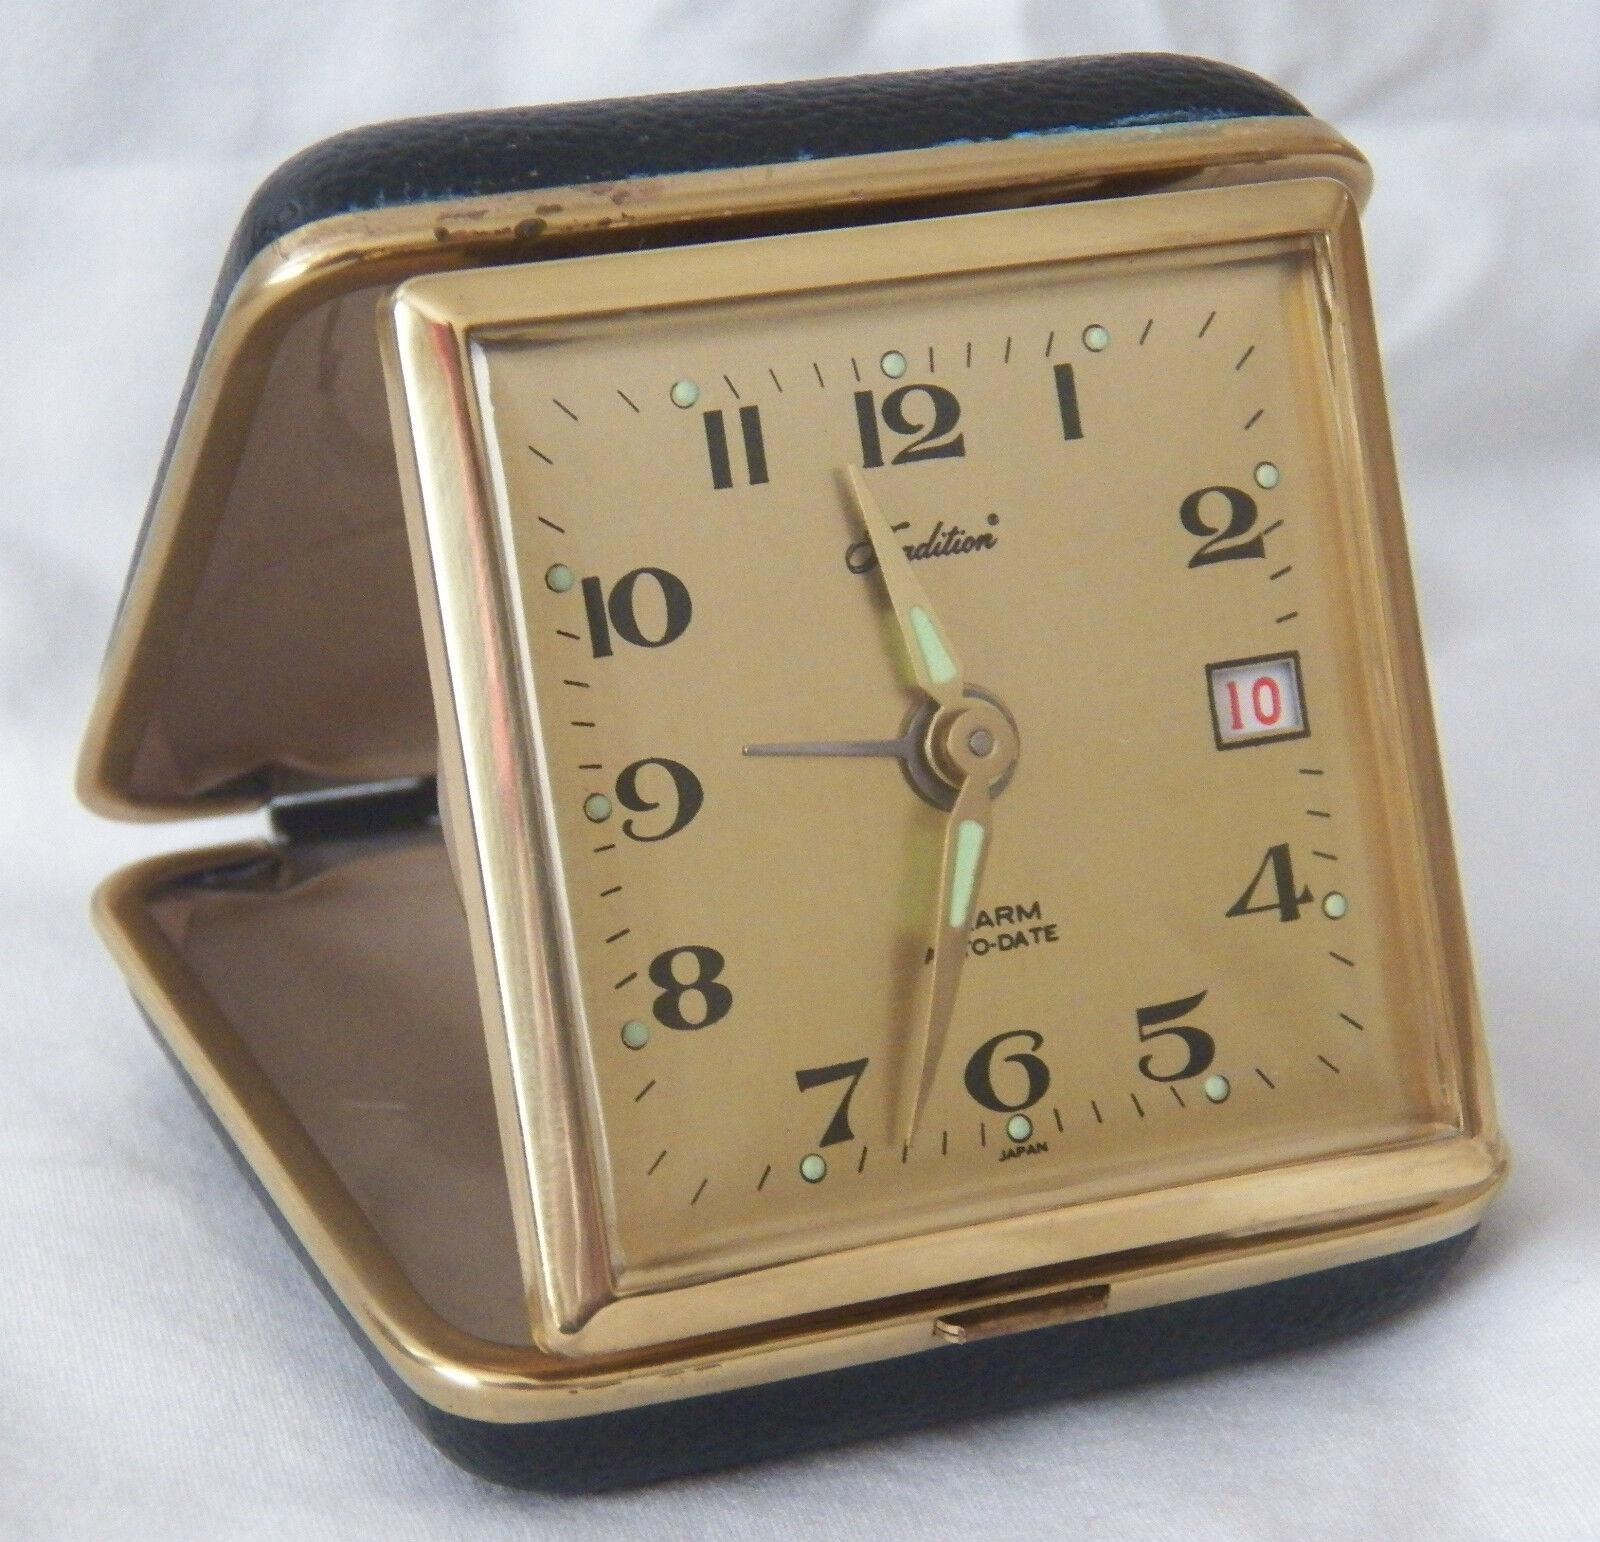 Unique Vintage Tradition Alarm Auto Date Glow Travel